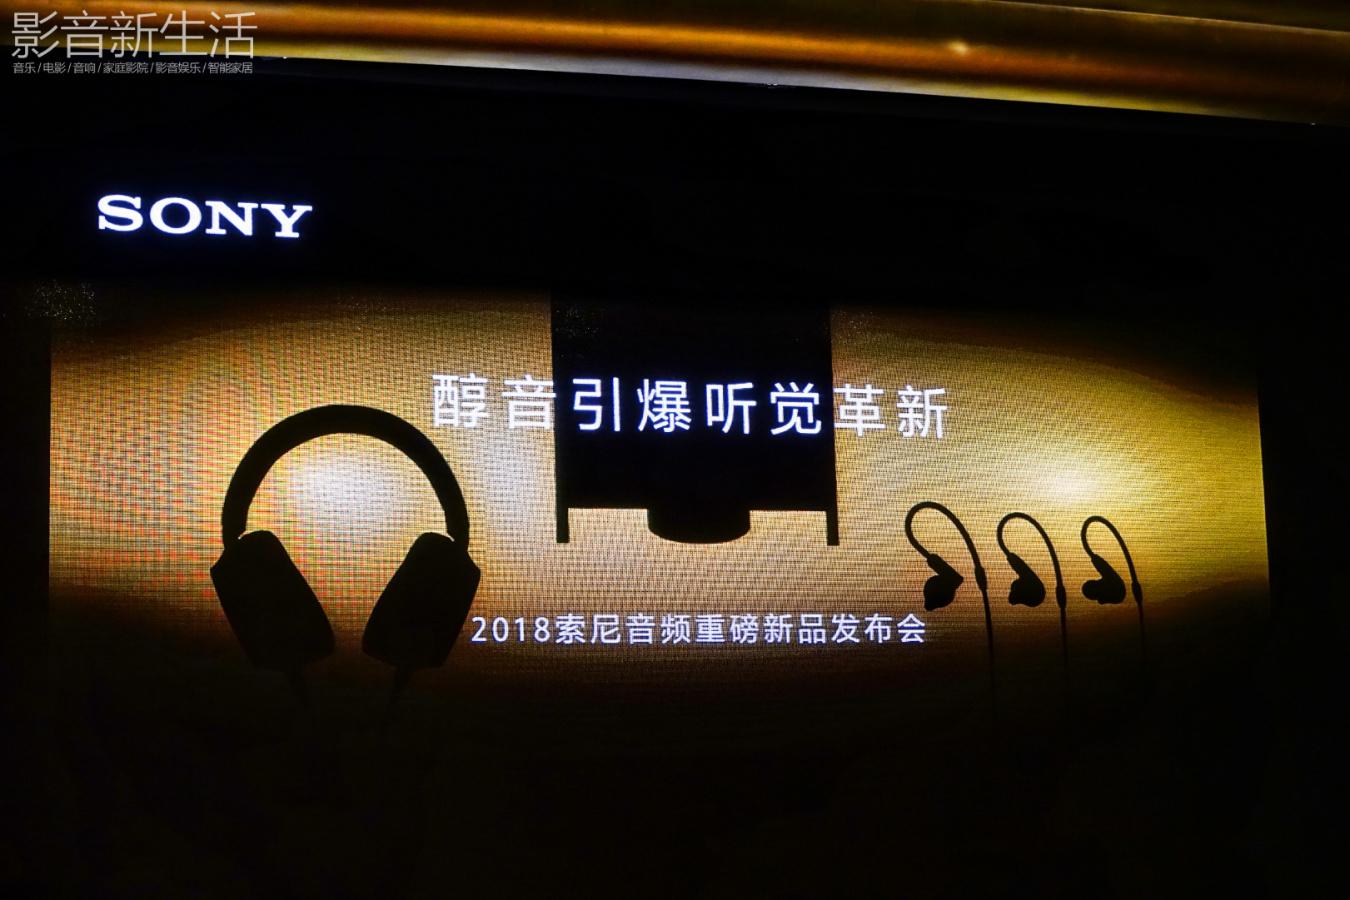 "Sony Hi Res 2018 9 - 新品 | ""重塑随身音乐娱乐王朝!"":Sony索尼发布Signature醇音系列新兄弟IER-Z1R和DMP-Z1,以及舞台监听耳机系列:IER-M7和IER-M9,还有升级款MDR-Z7M2!"